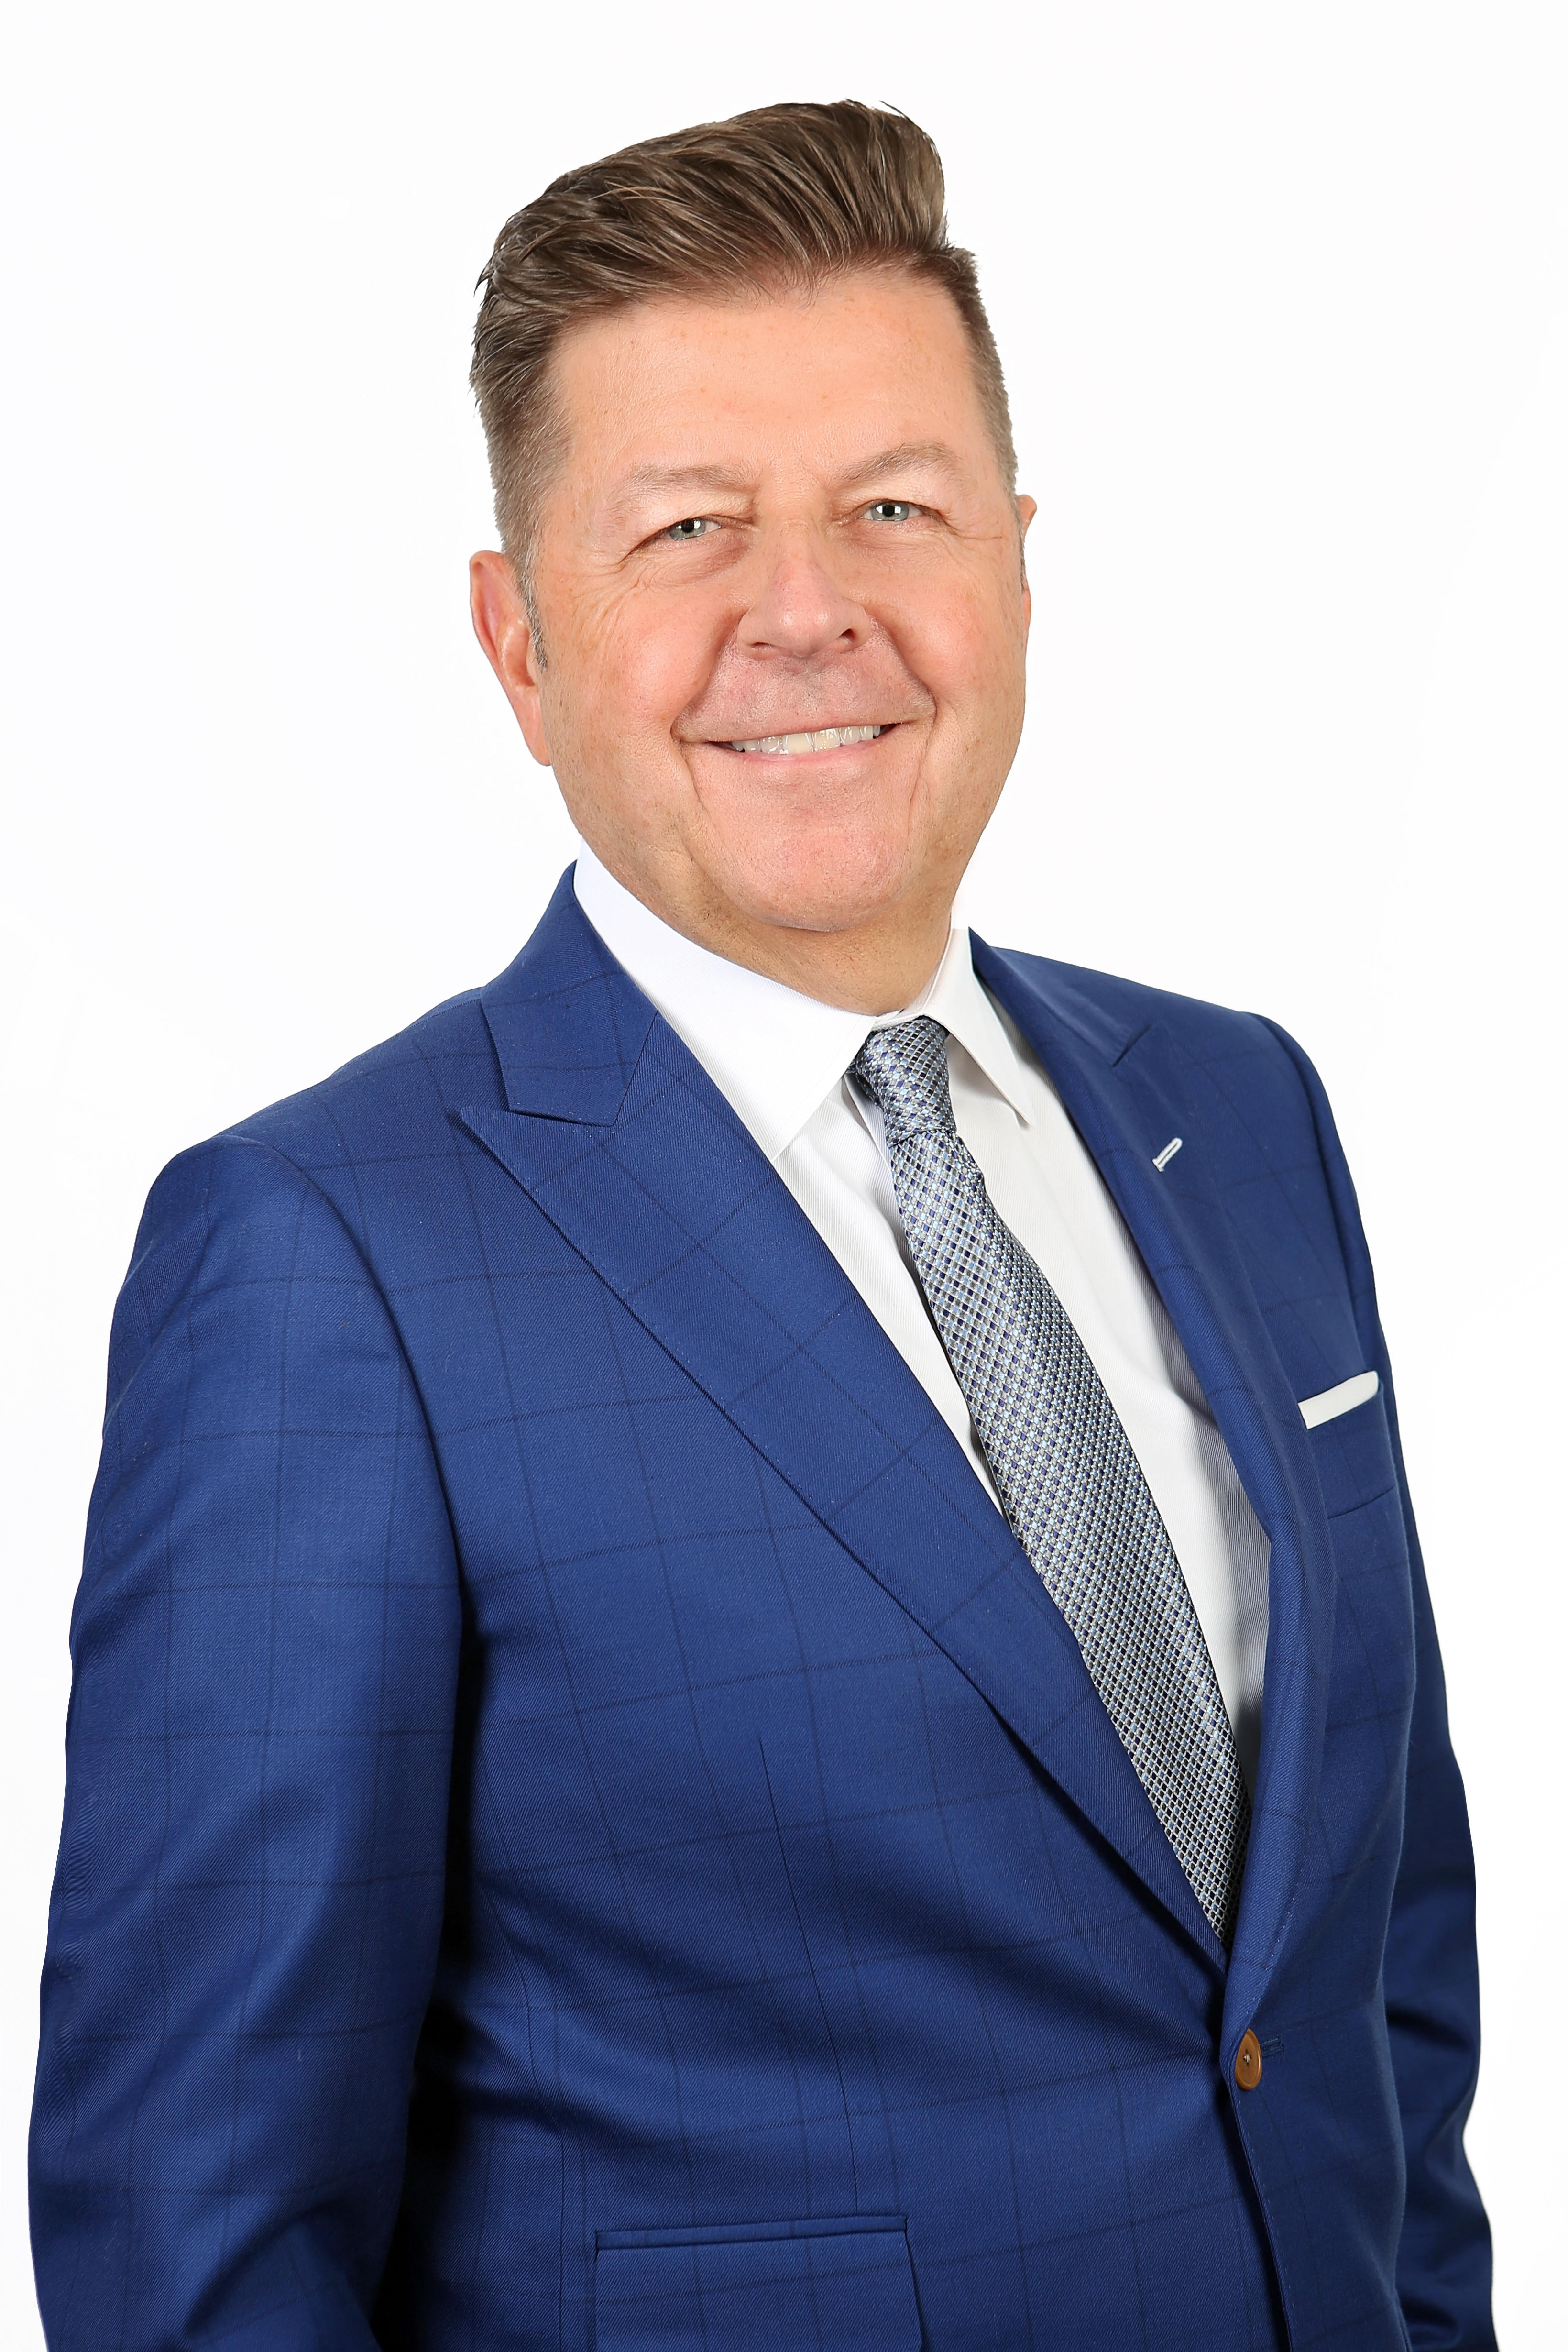 Nick Maggio - ScotiaMcLeod, Scotia Wealth Management - Vaughan, ON L4K 0J8 - (905)695-1510 | ShowMeLocal.com